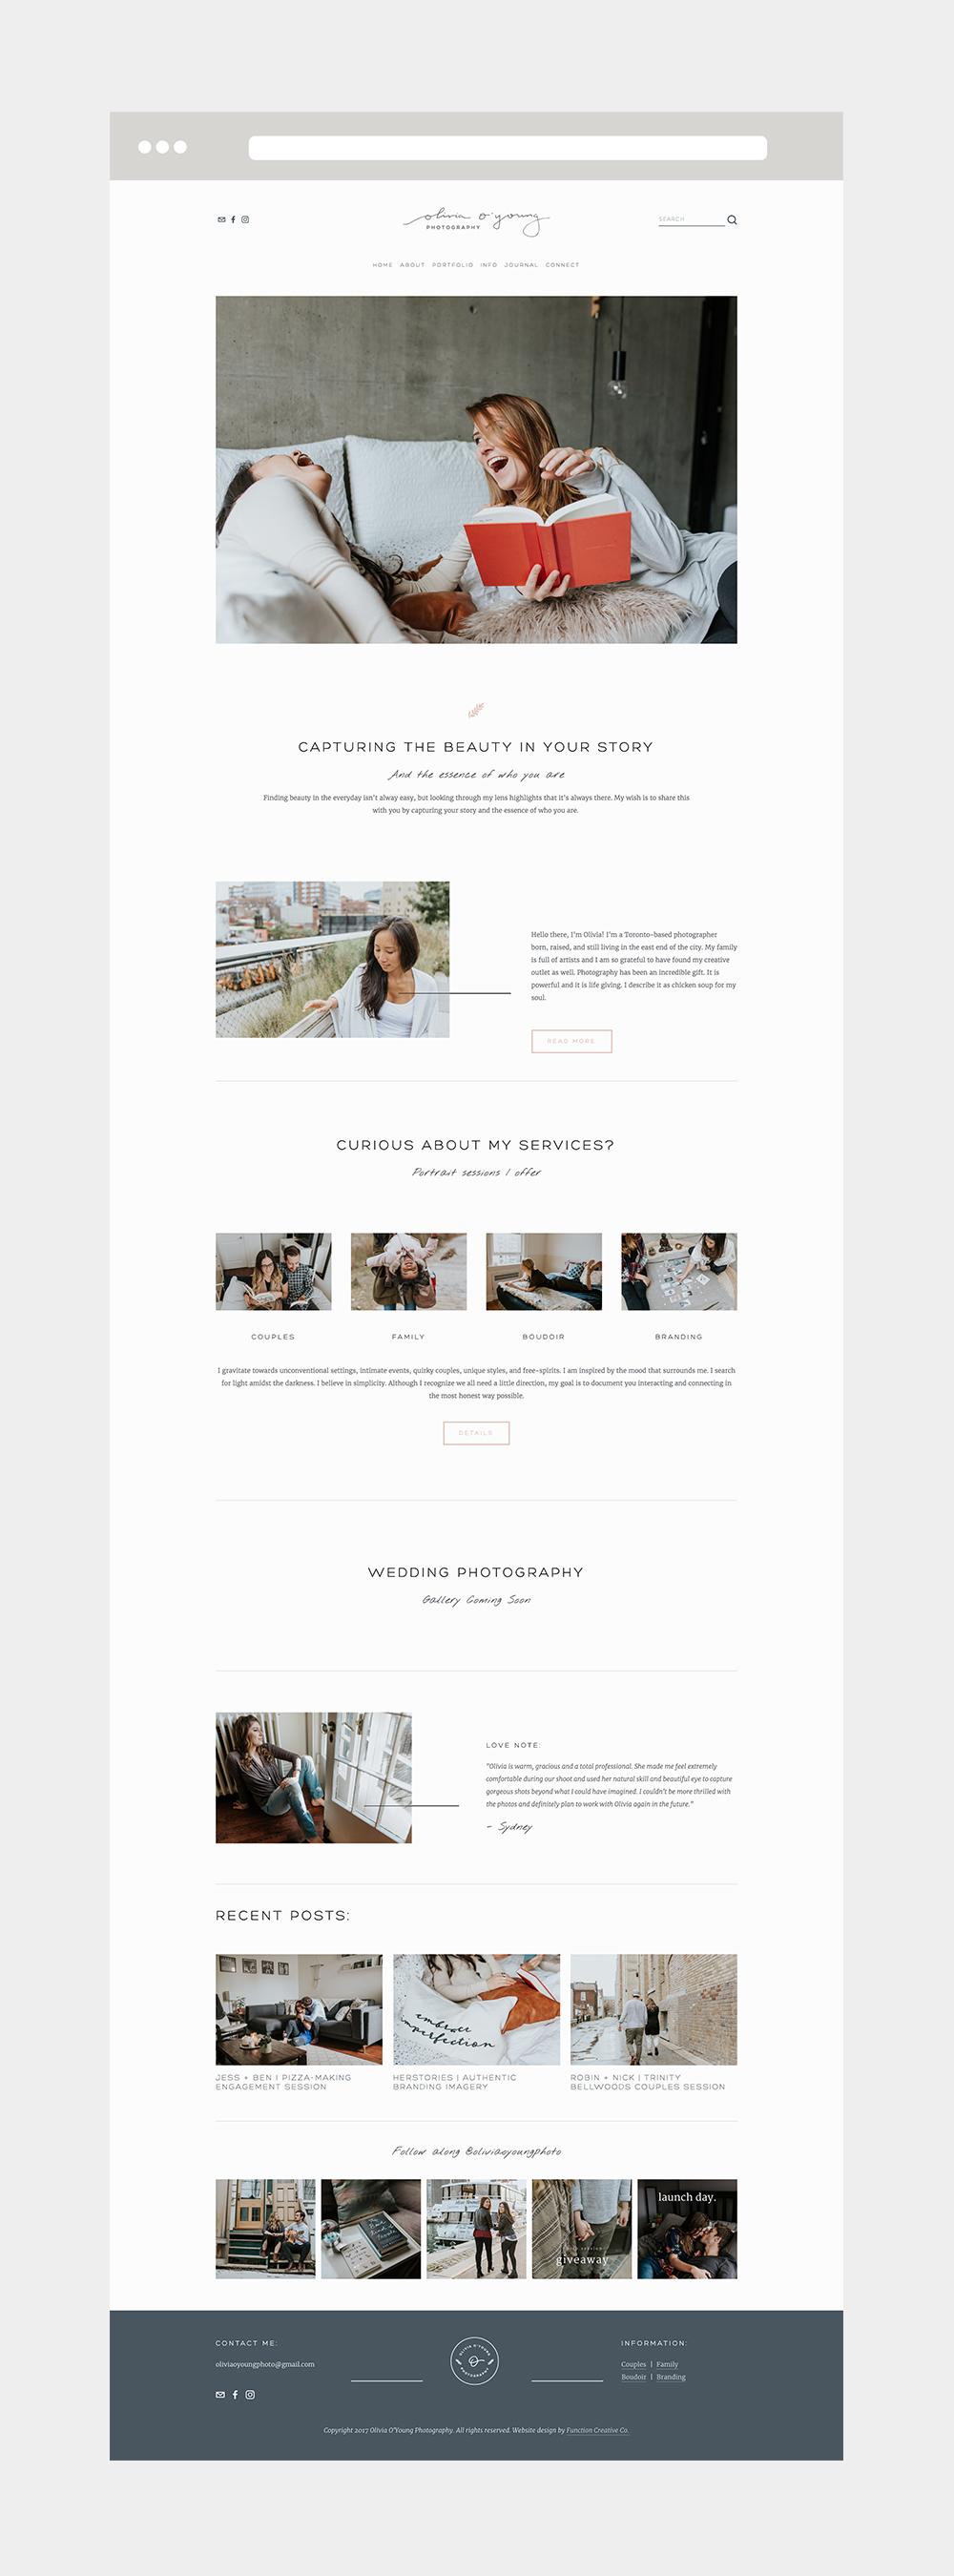 olivia-oyoung-web-capture-mockup.jpg